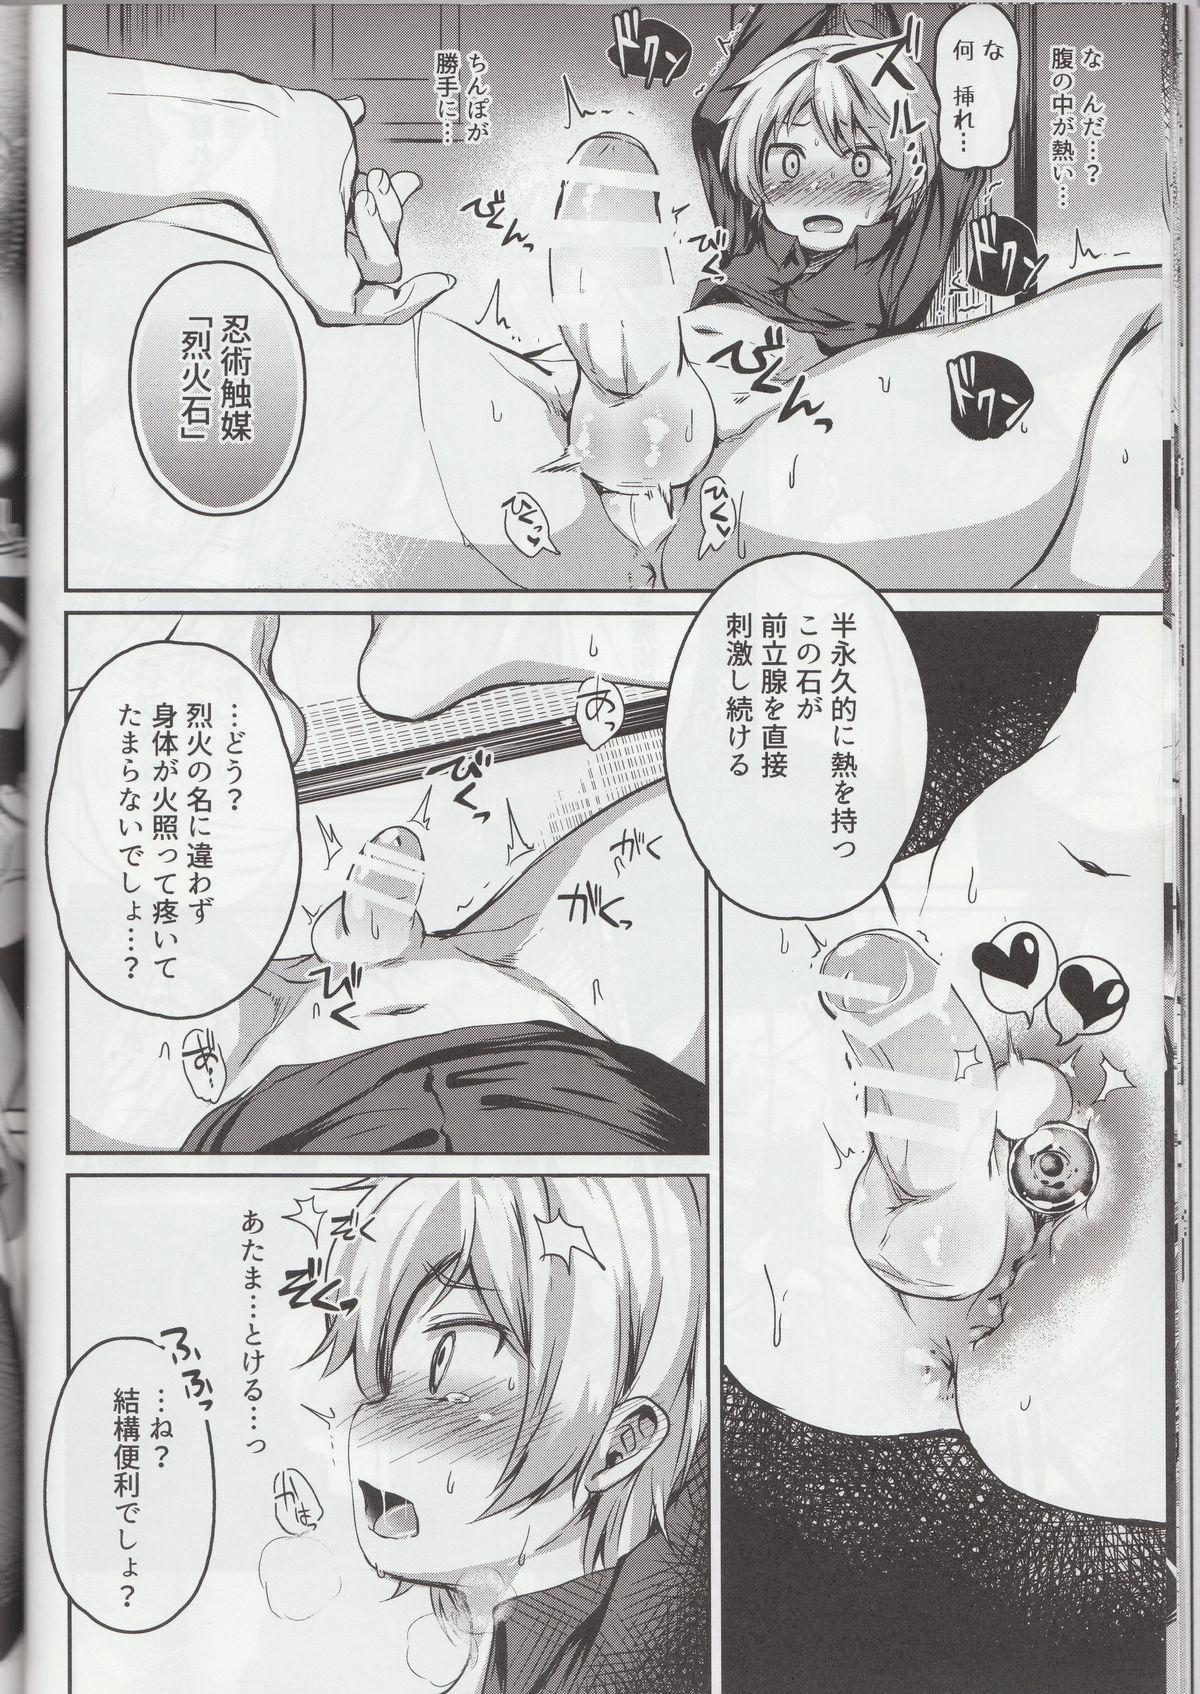 Shounen Ninja Koushoku Kitan 16